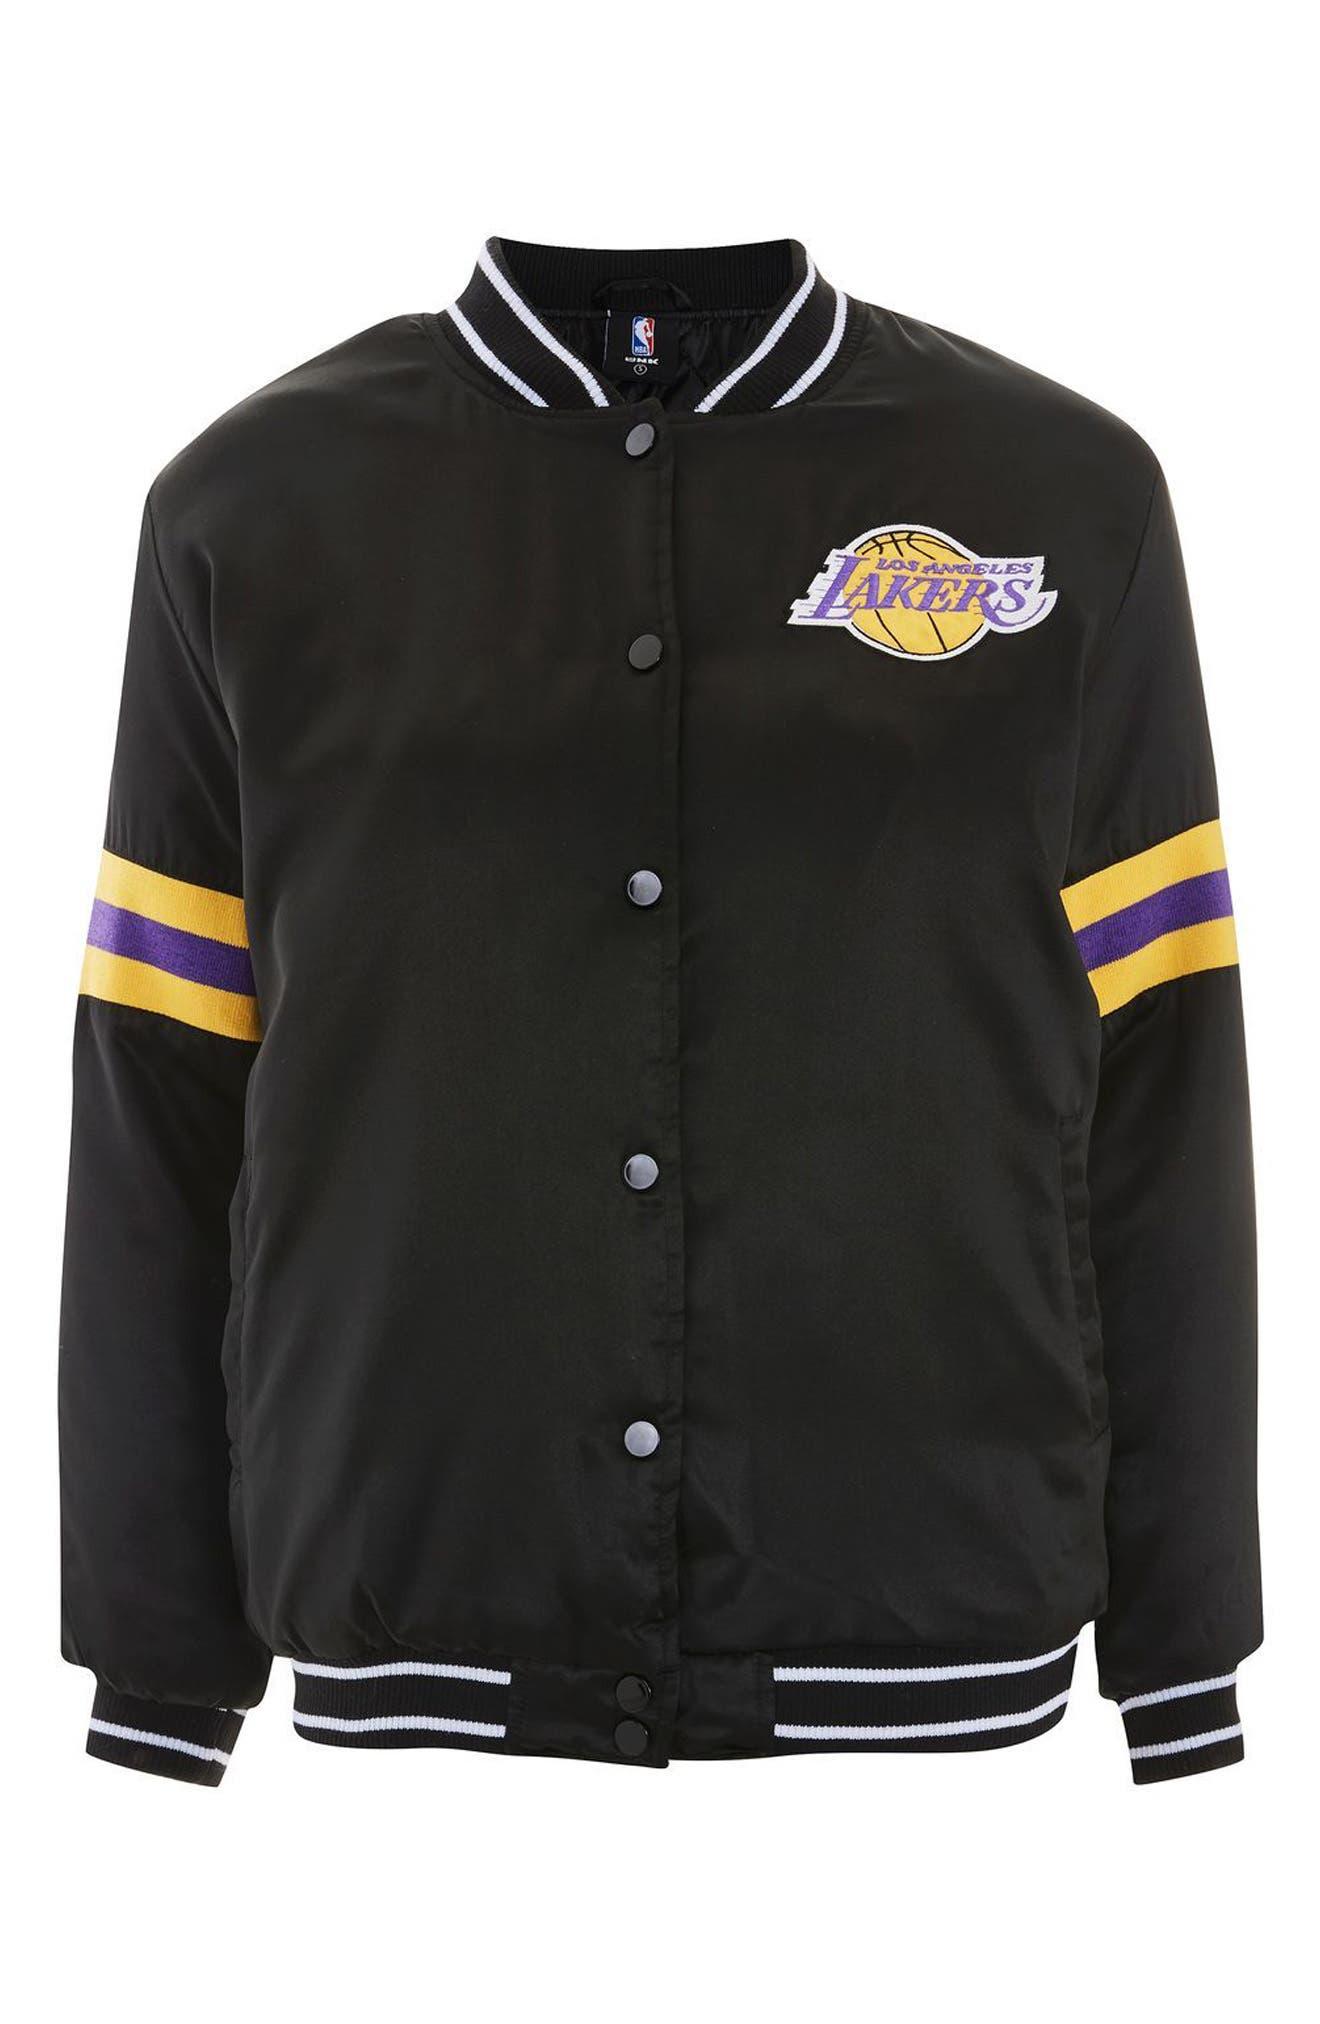 Alternate Image 4  - Topshop x UNK Lakers Bomber Jacket